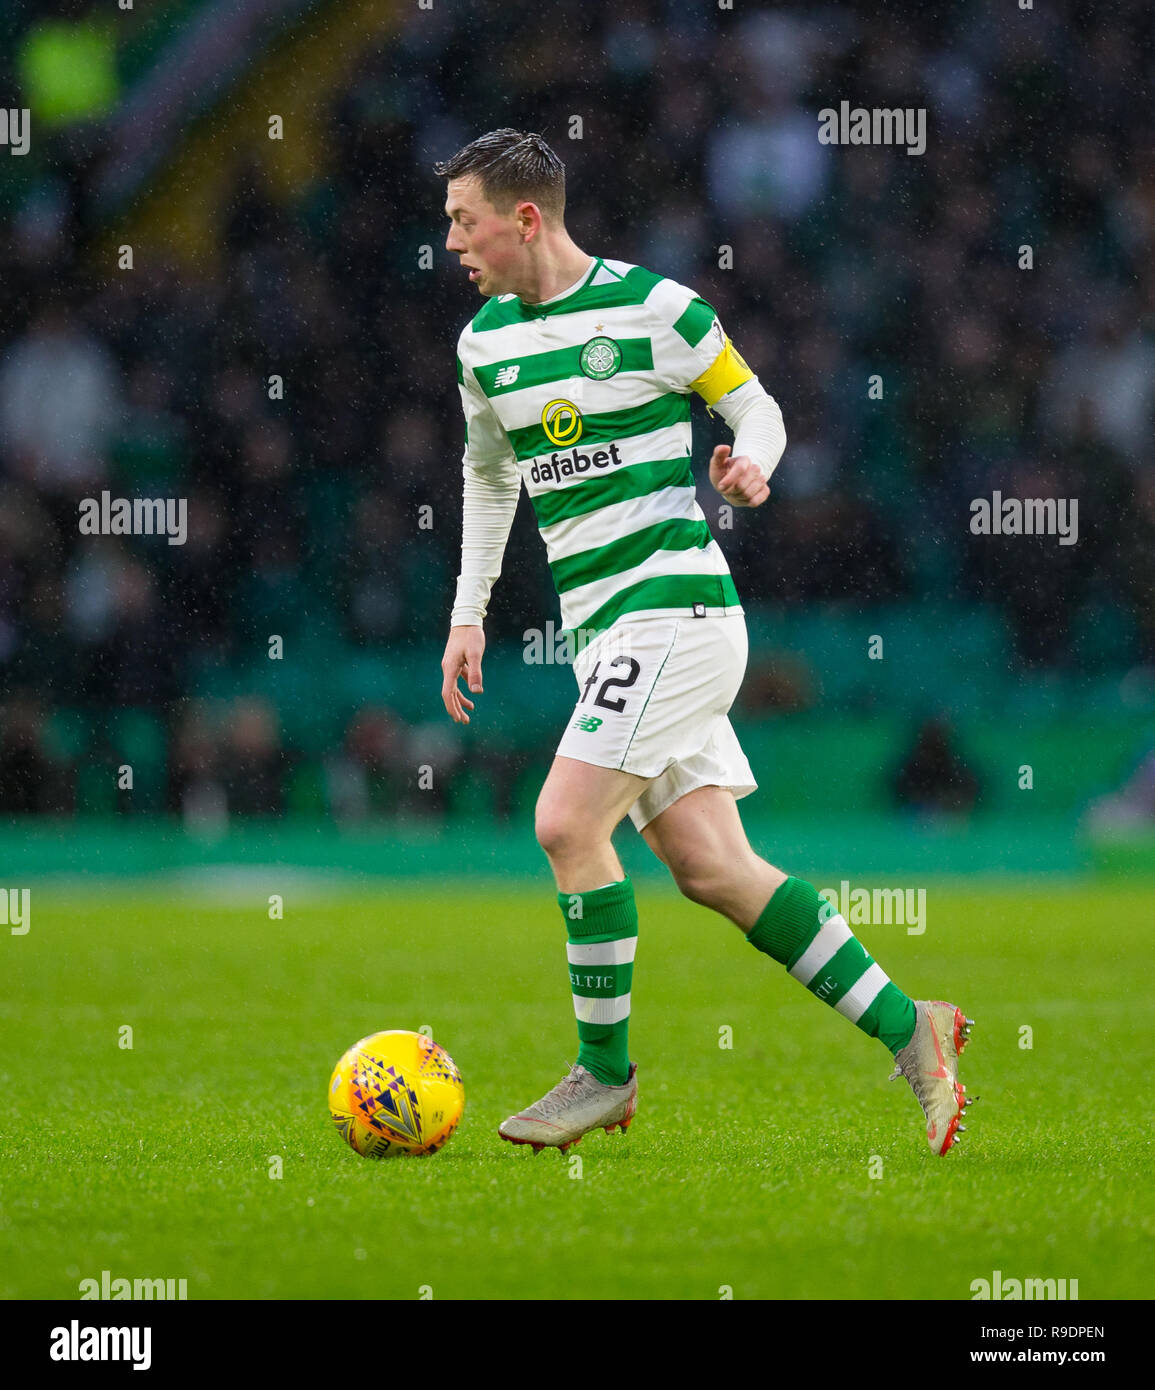 Celtic Park, Glasgow, UK. 22nd Dec, 2018. Ladbrokes Premiership football, Celtic versus Dundee; Callum McGregor of Celtic Credit: Action Plus Sports/Alamy Live News - Stock Image